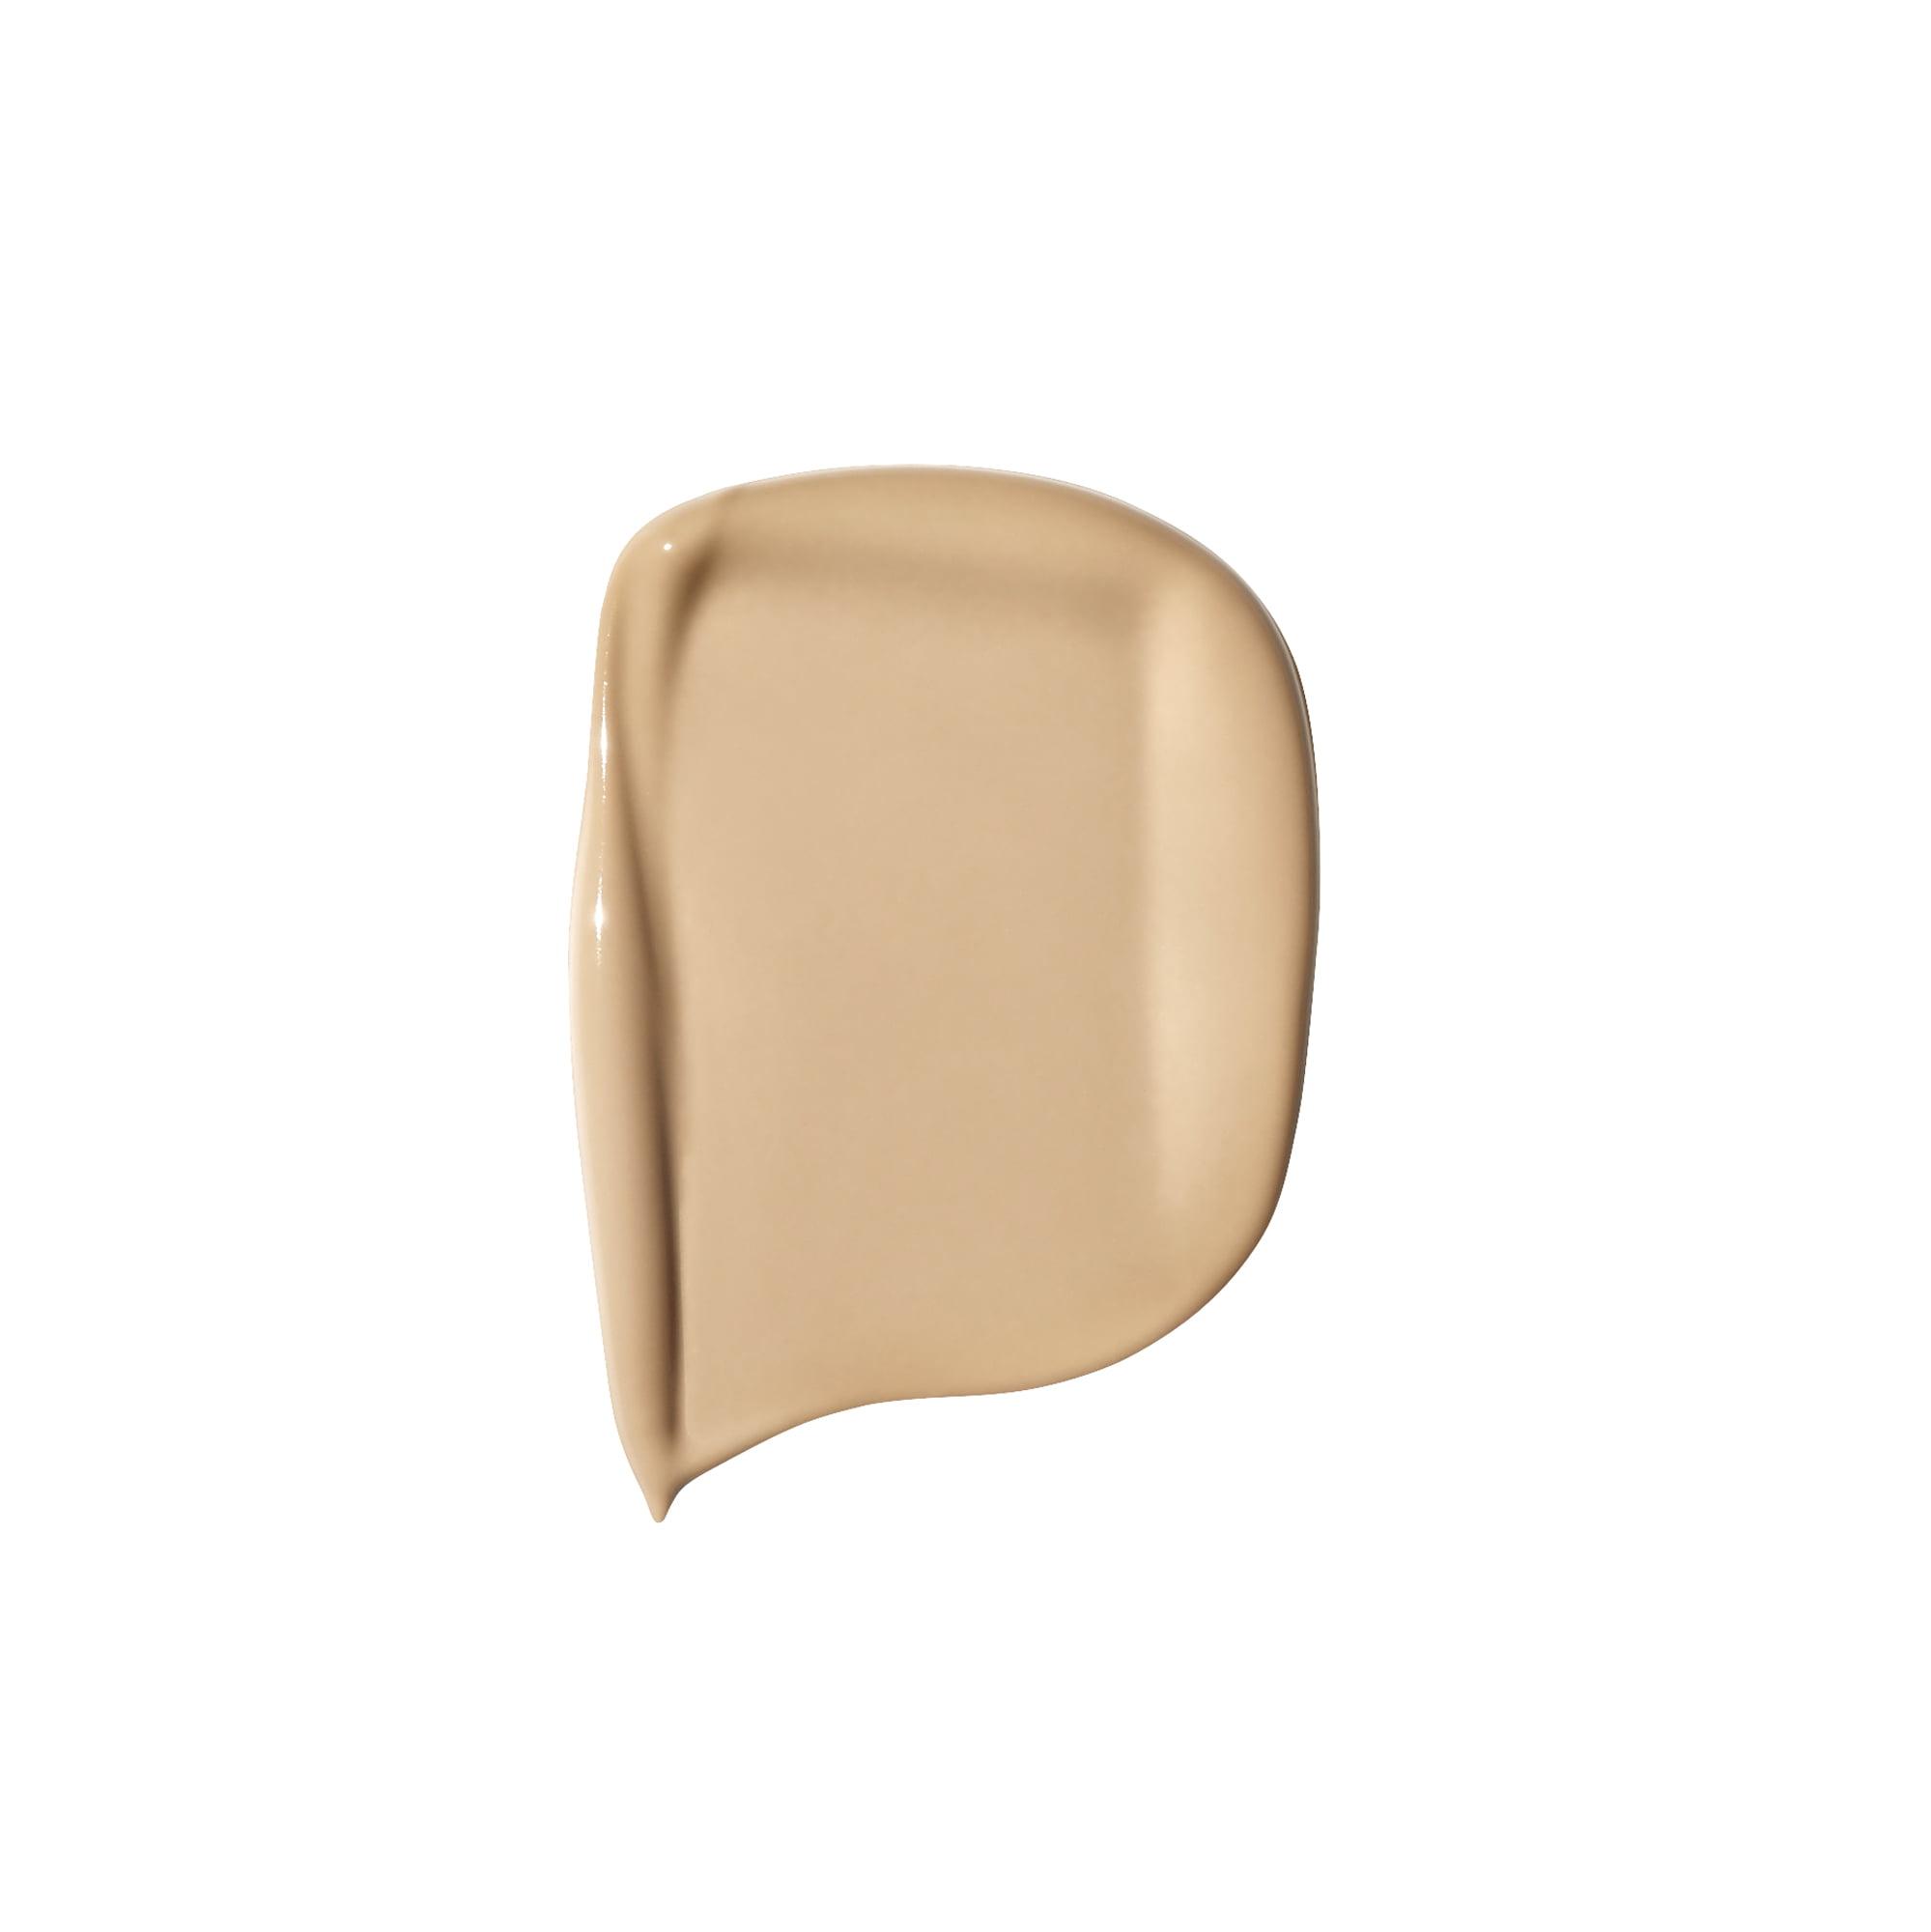 Revlon Colorstay Makeup For Normal Dry Skin Spf 20 Longwear Liquid Foundation Natural Finish Oil Free 150 Buff 1 0 Oz Walmart Com Walmart Com